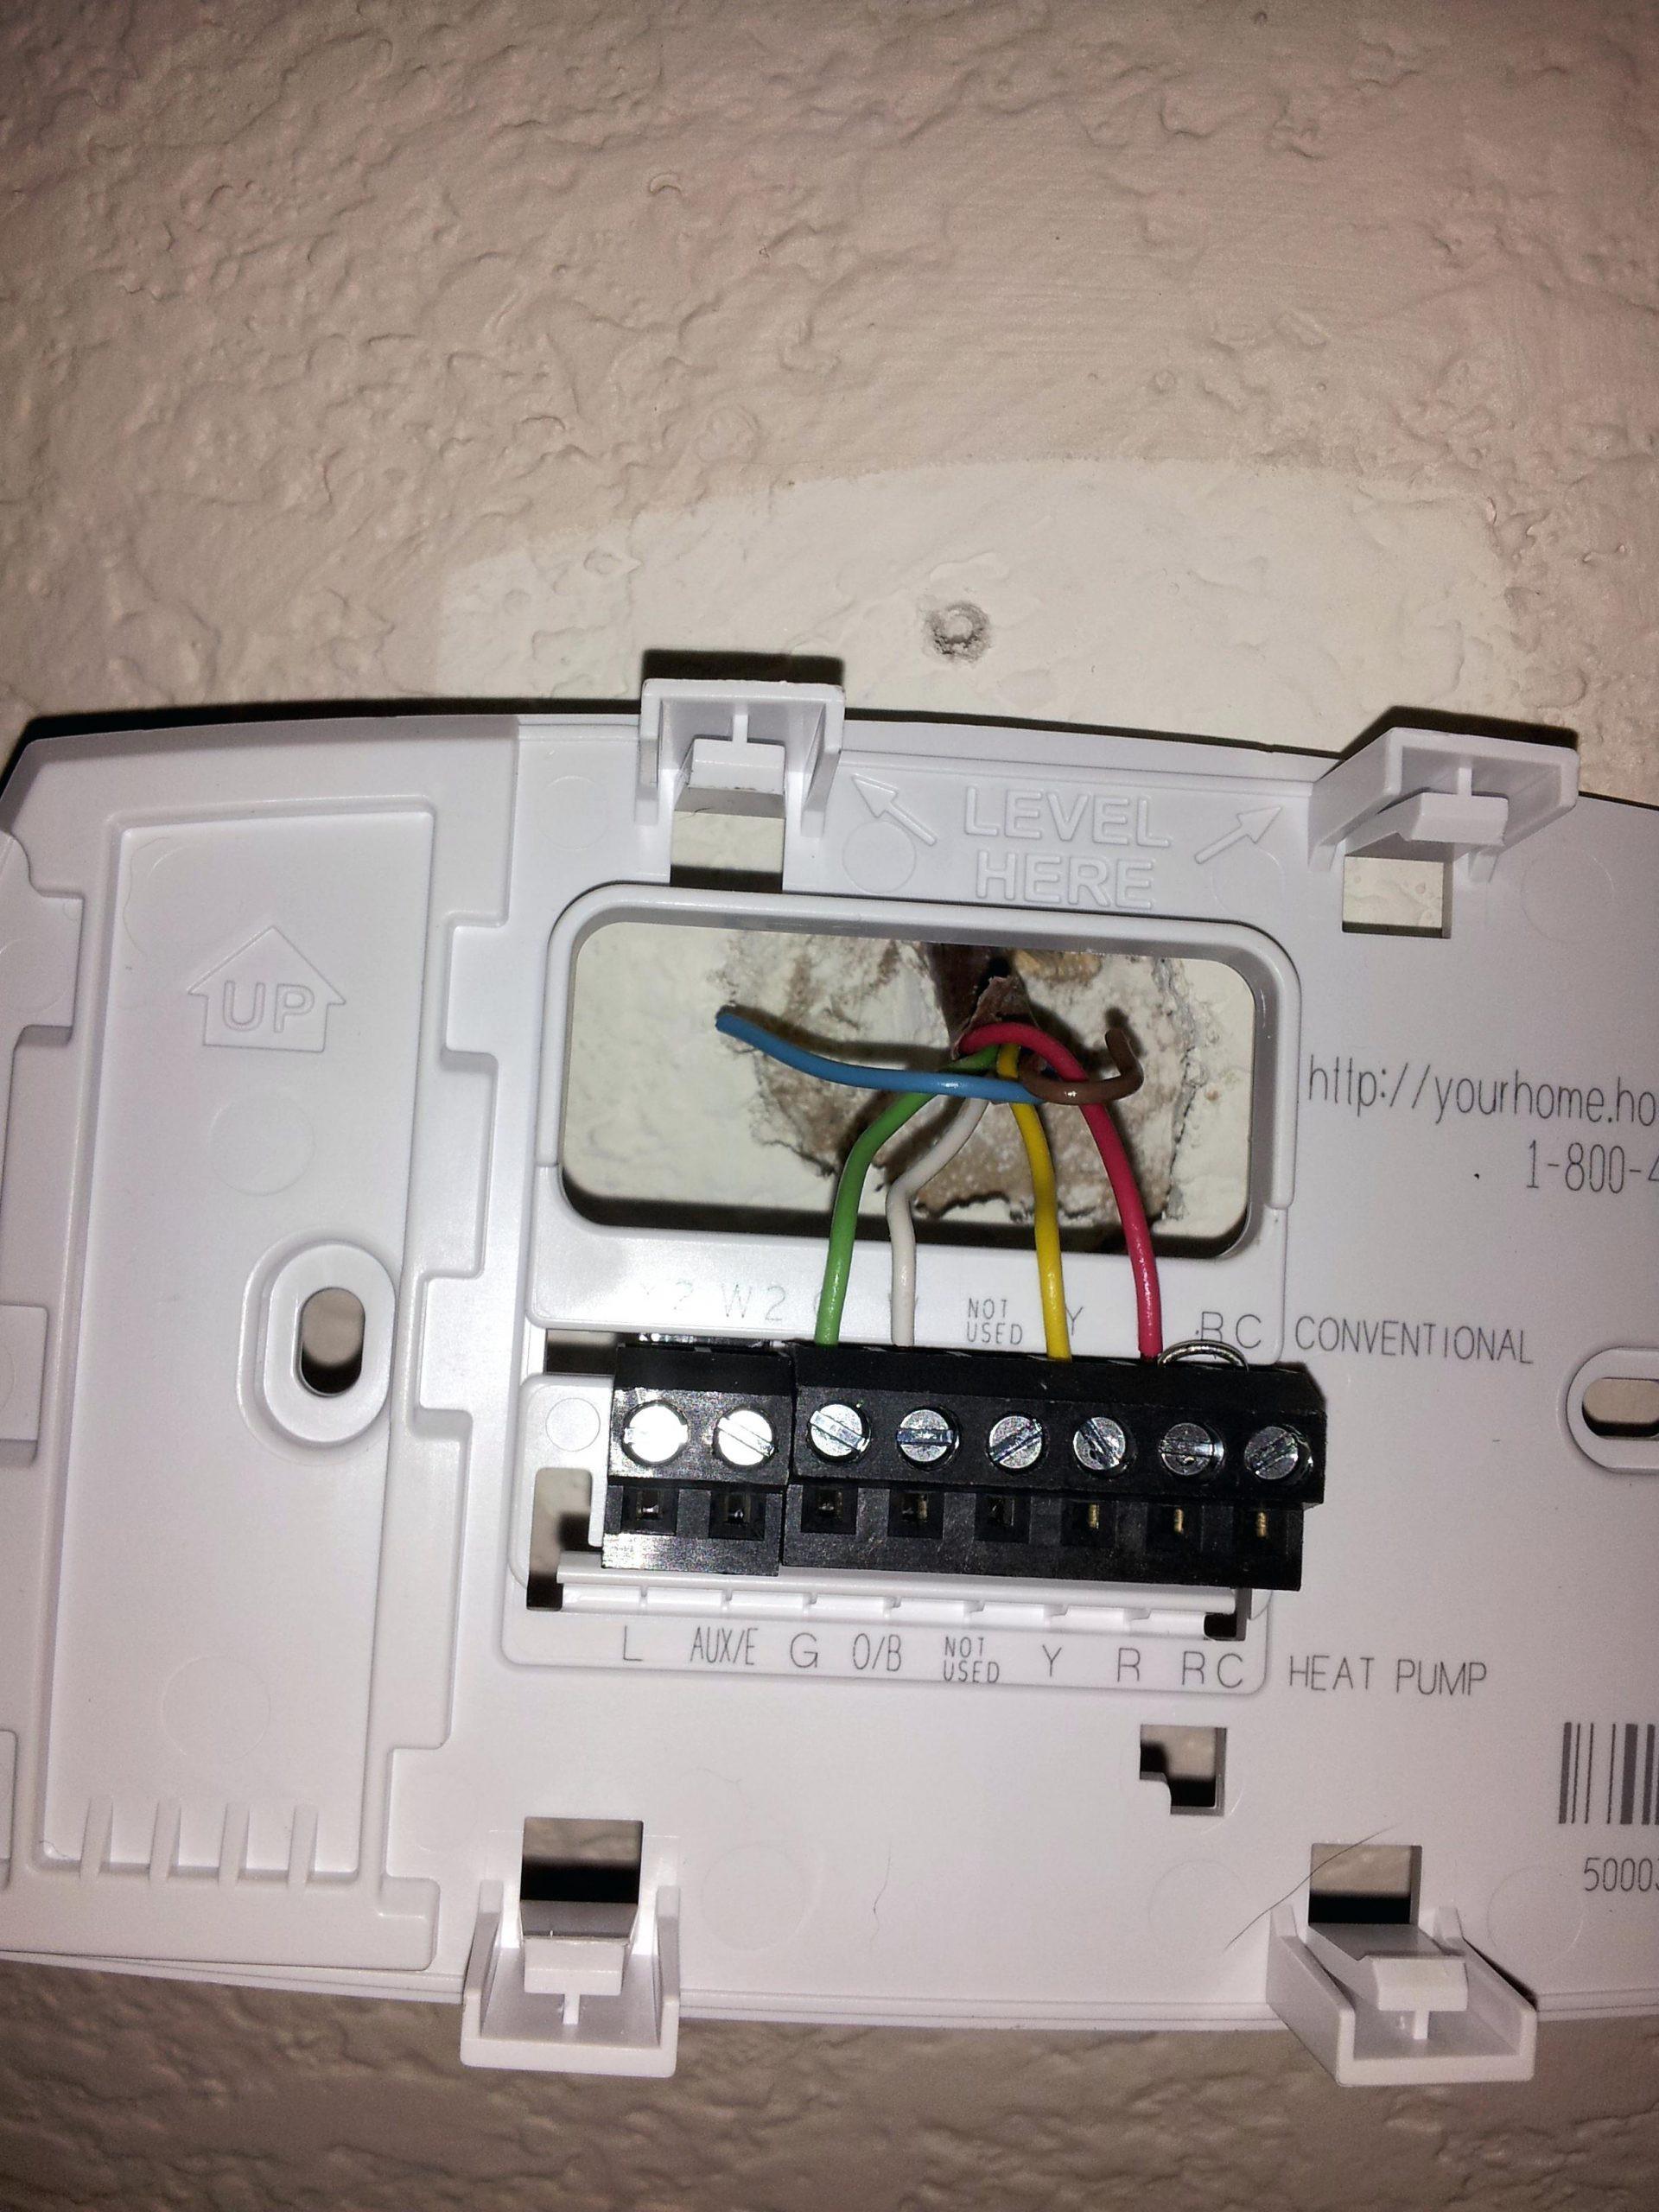 Honeywell Heat Pump Thermostat Wiring Diagram - Lorestan - Honeywell Heat Pump Thermostat Wiring Diagram